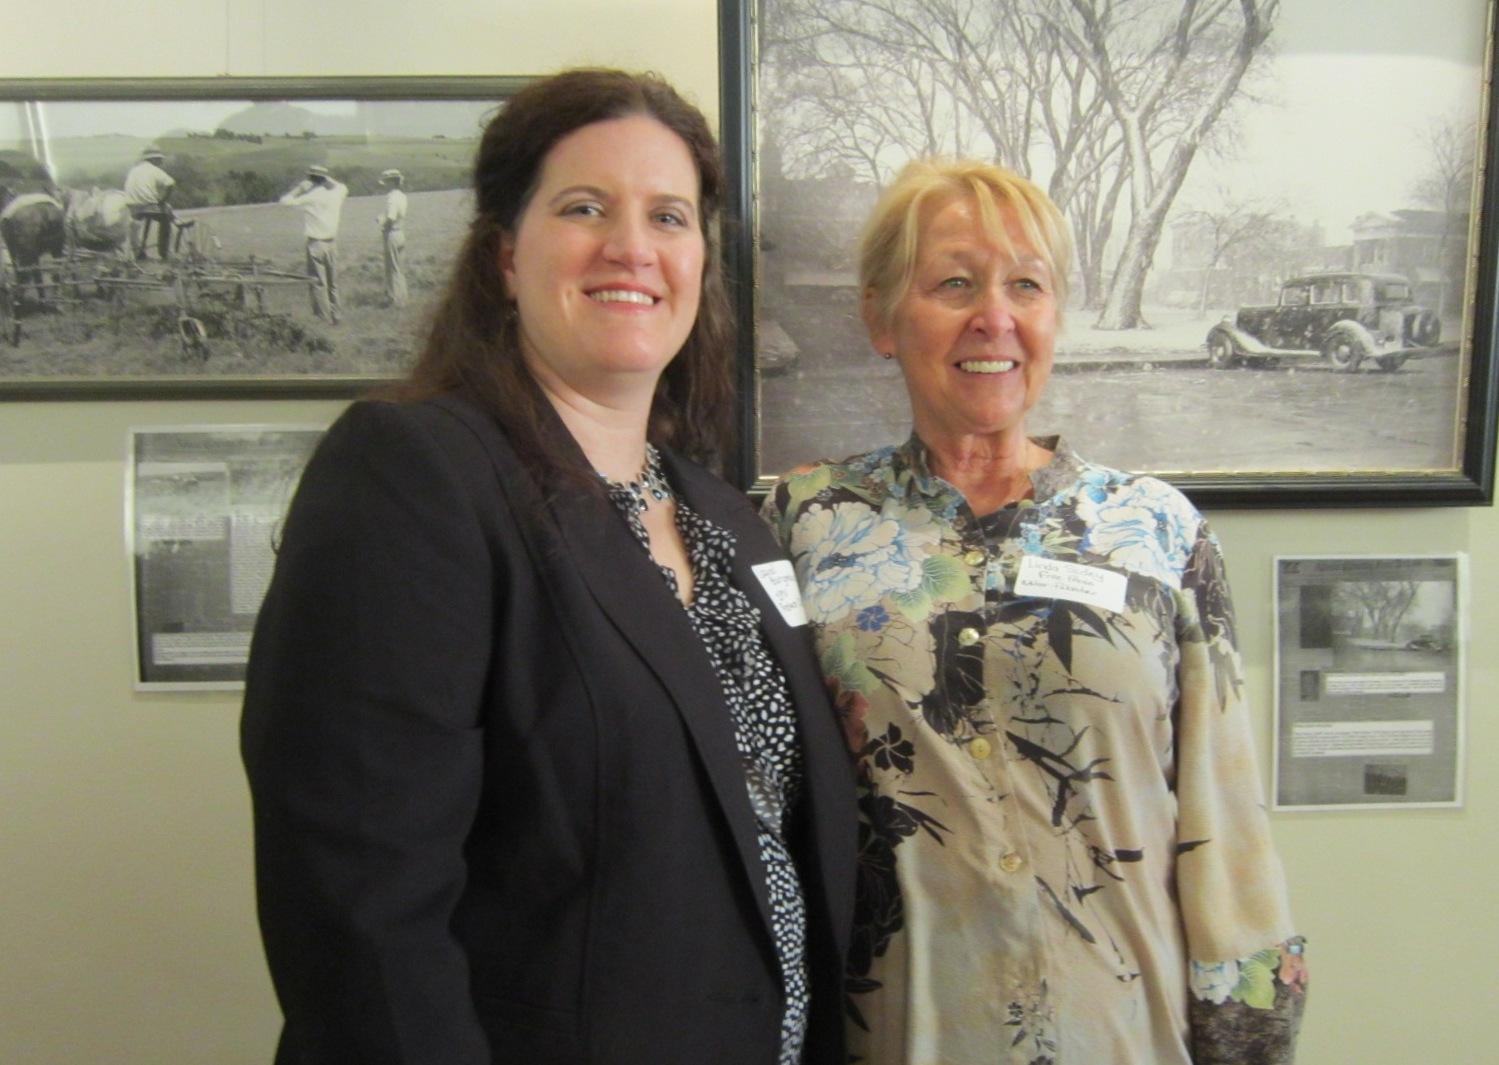 Laurel Bower Burgmaier & Linda Sidey.JPG